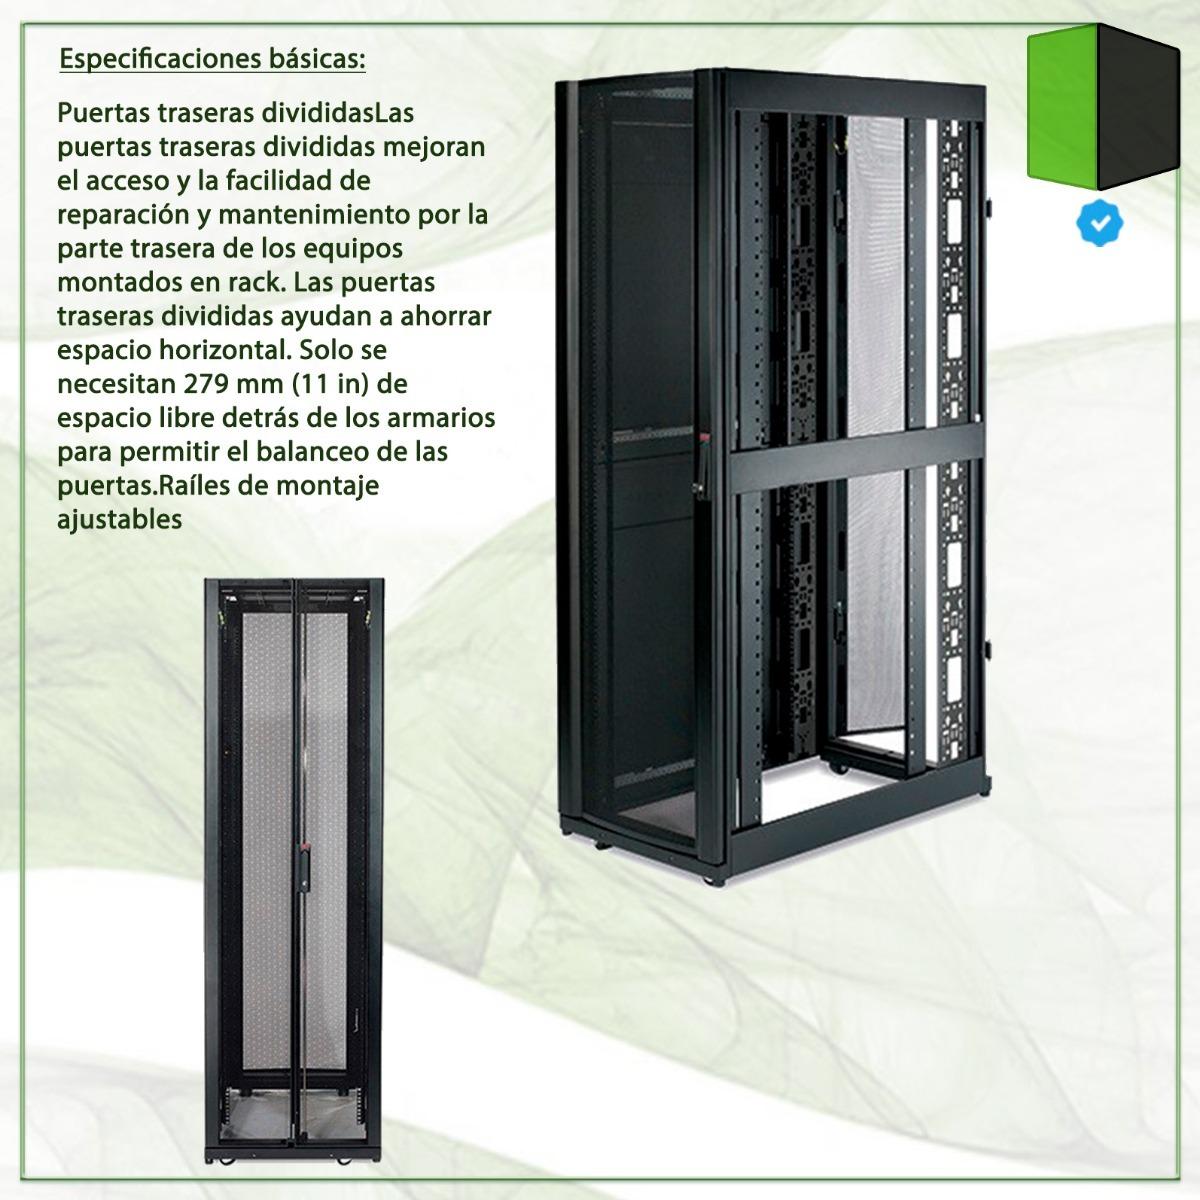 Rack Apc Ar3100 Netshelter Sx 42u 600mm Wide X 1070mm 11503697 Server Enclosure Cargando Zoom